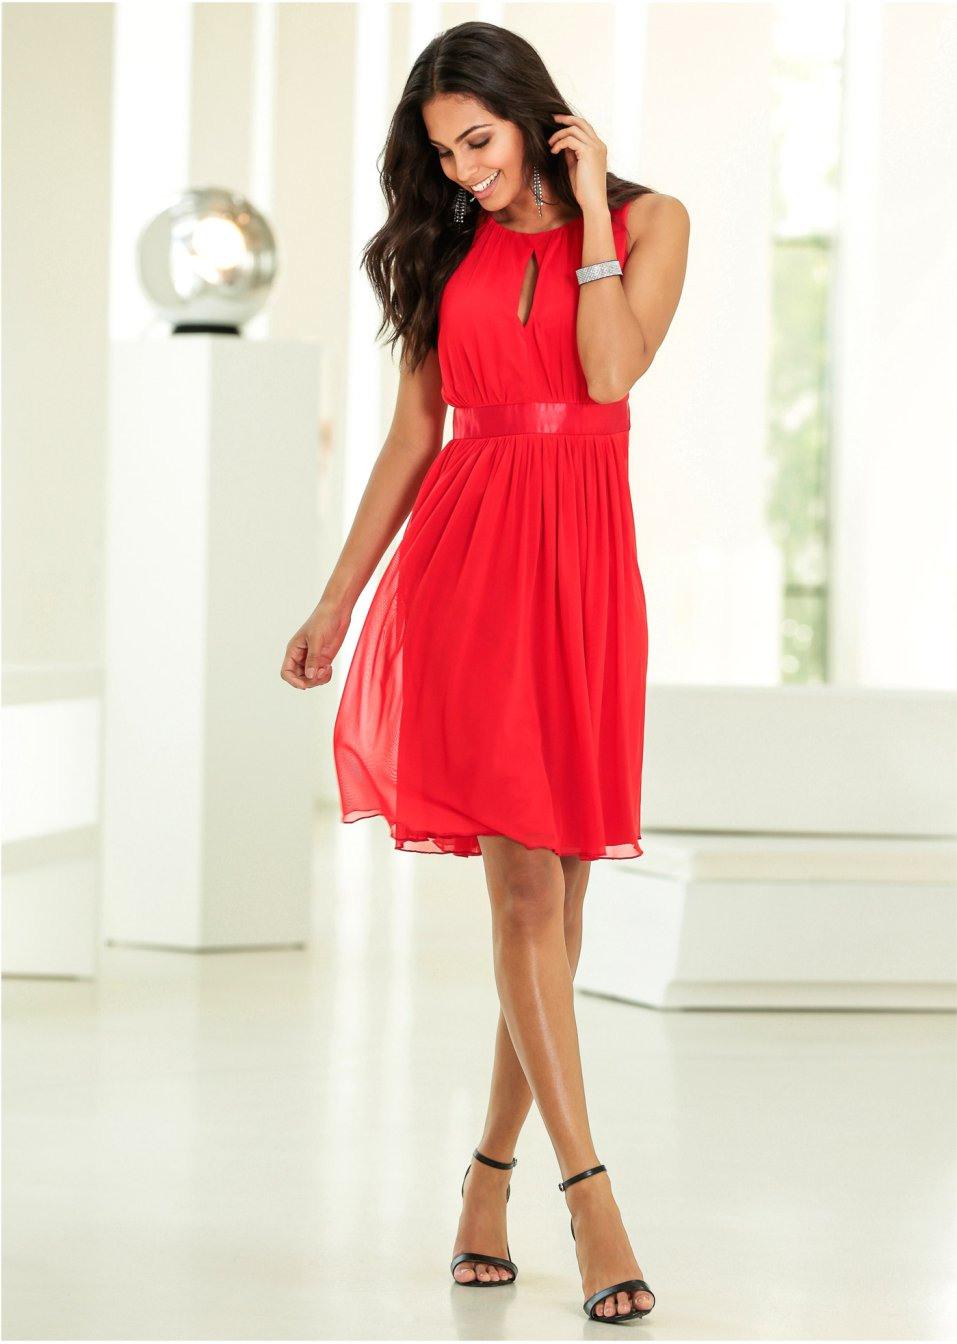 15 Einzigartig Kleid Orange Kurz SpezialgebietAbend Elegant Kleid Orange Kurz Galerie